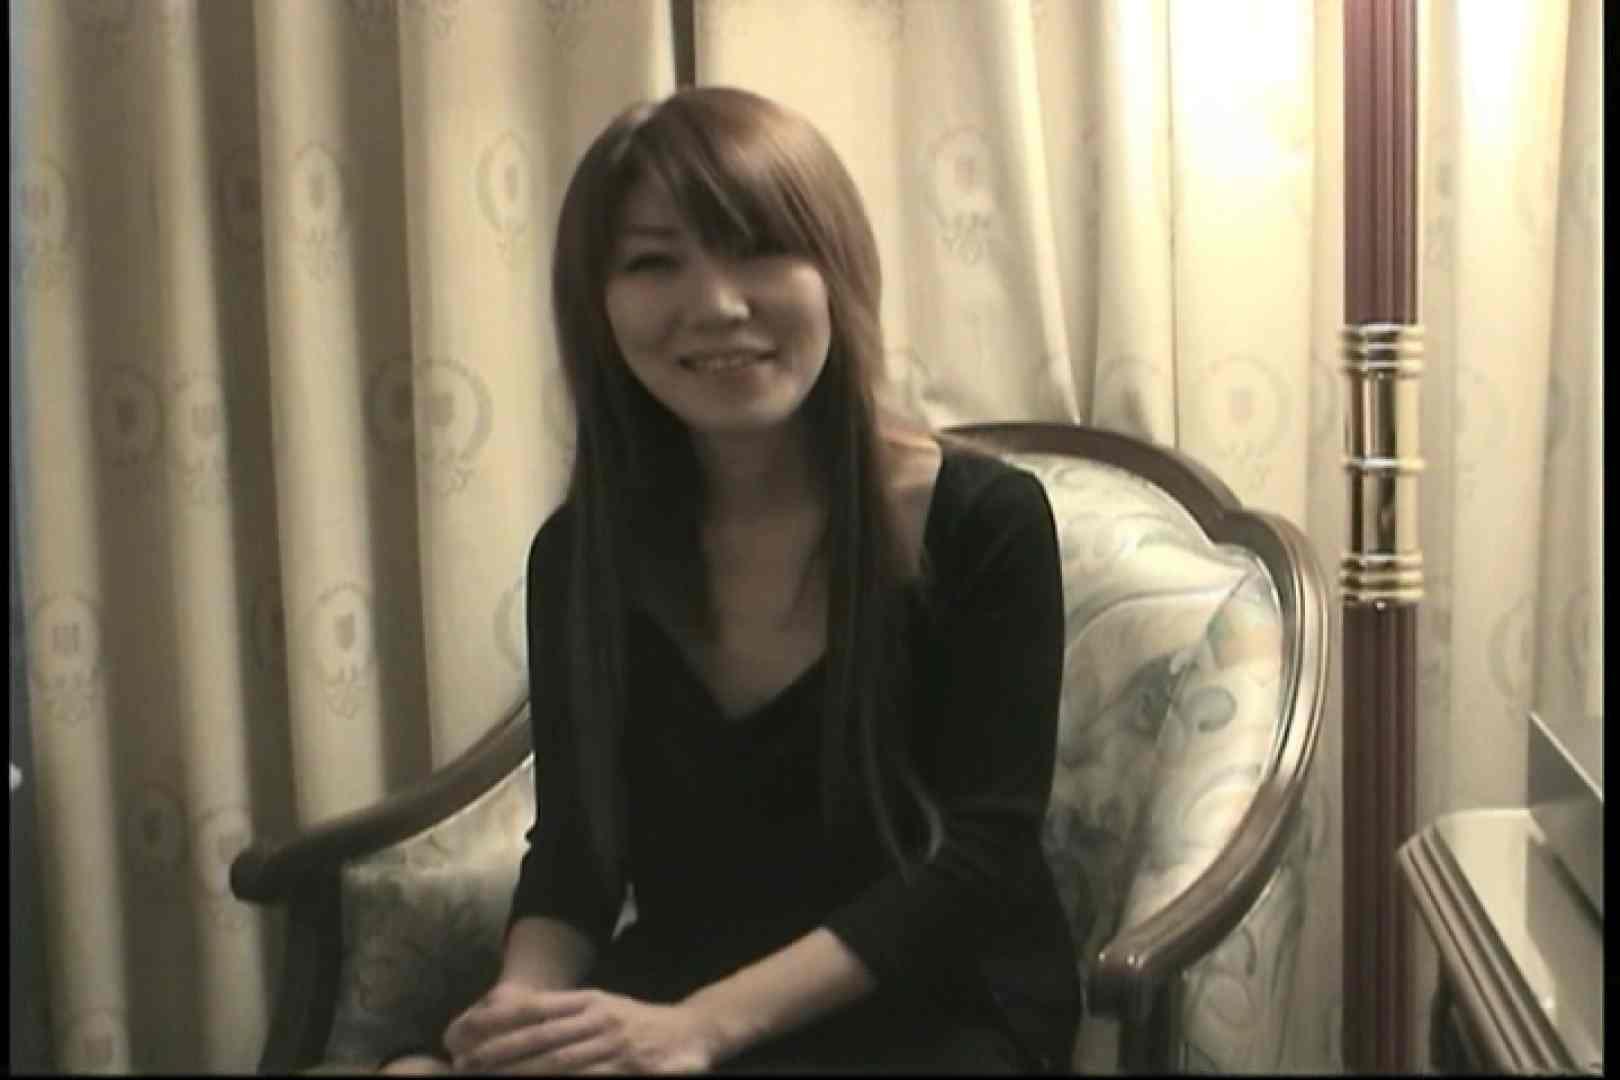 H大好きな清楚系の美ボディお姉さんとホテルでSEX~安西みか~ ホテル 性交動画流出 64PIX 3